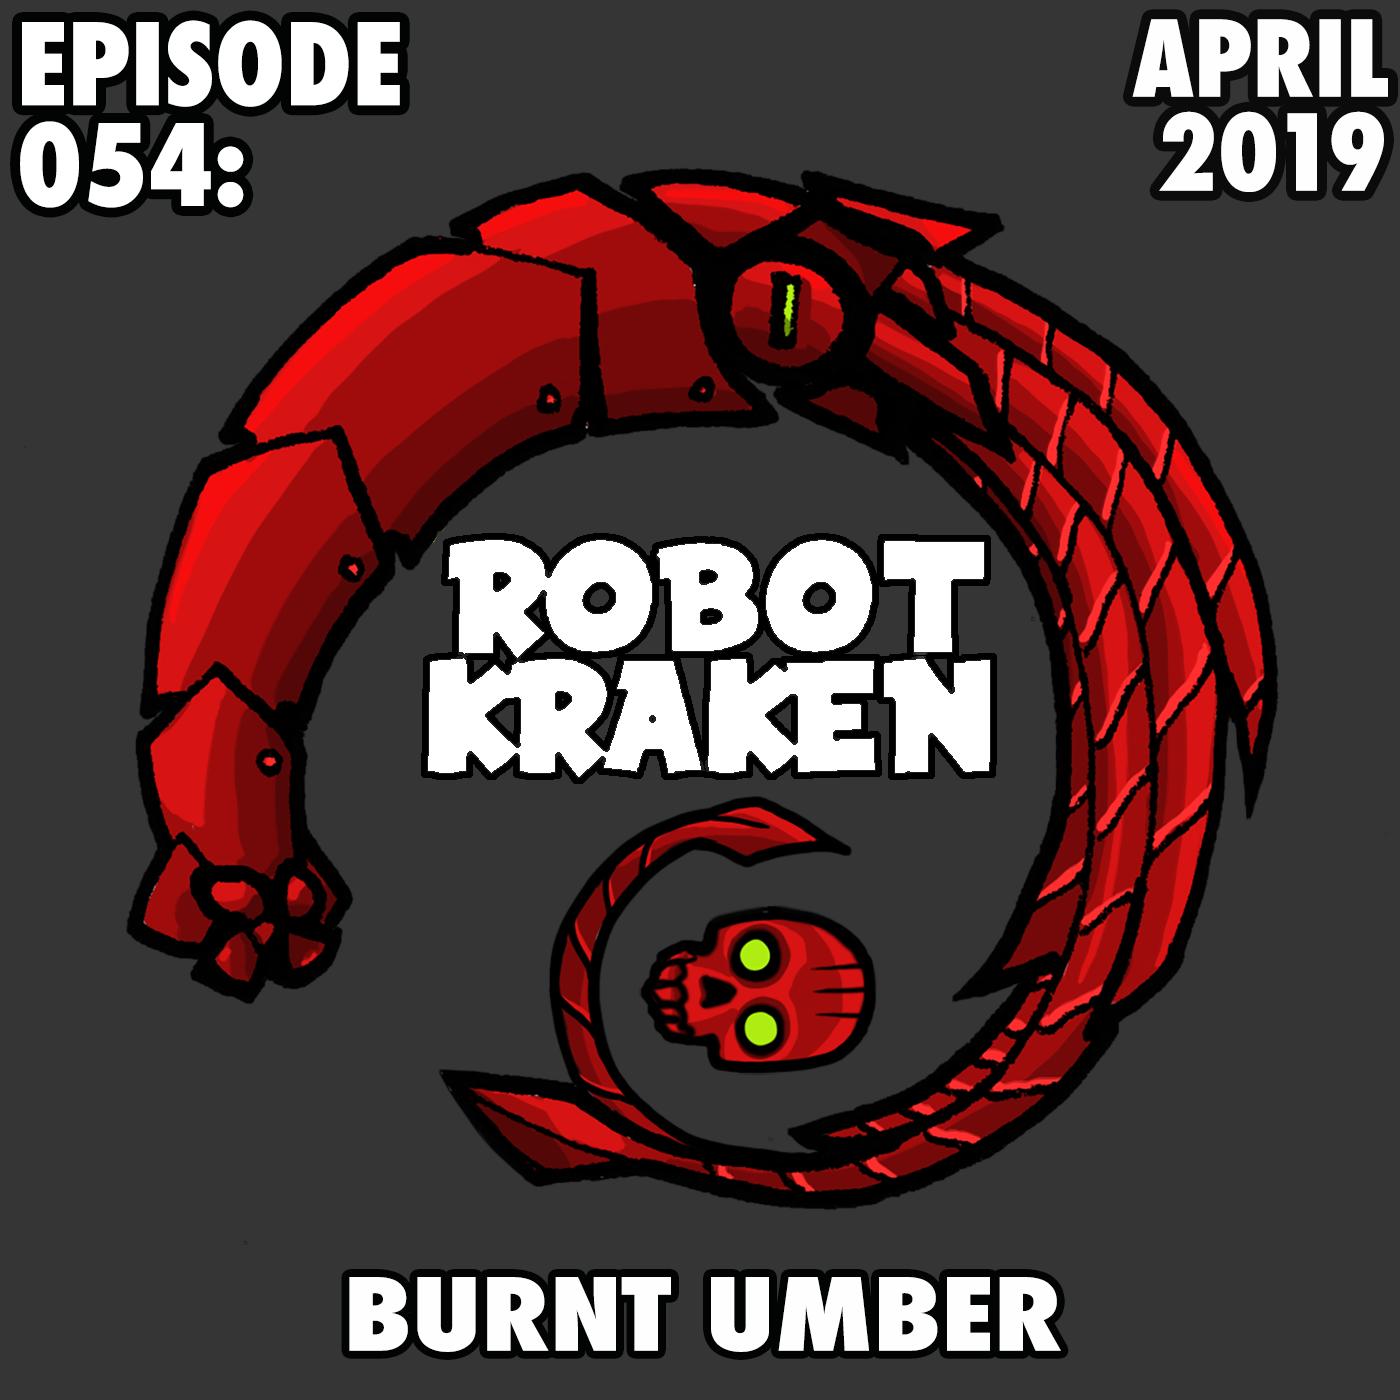 Robot-Kraken-054-Cover.png